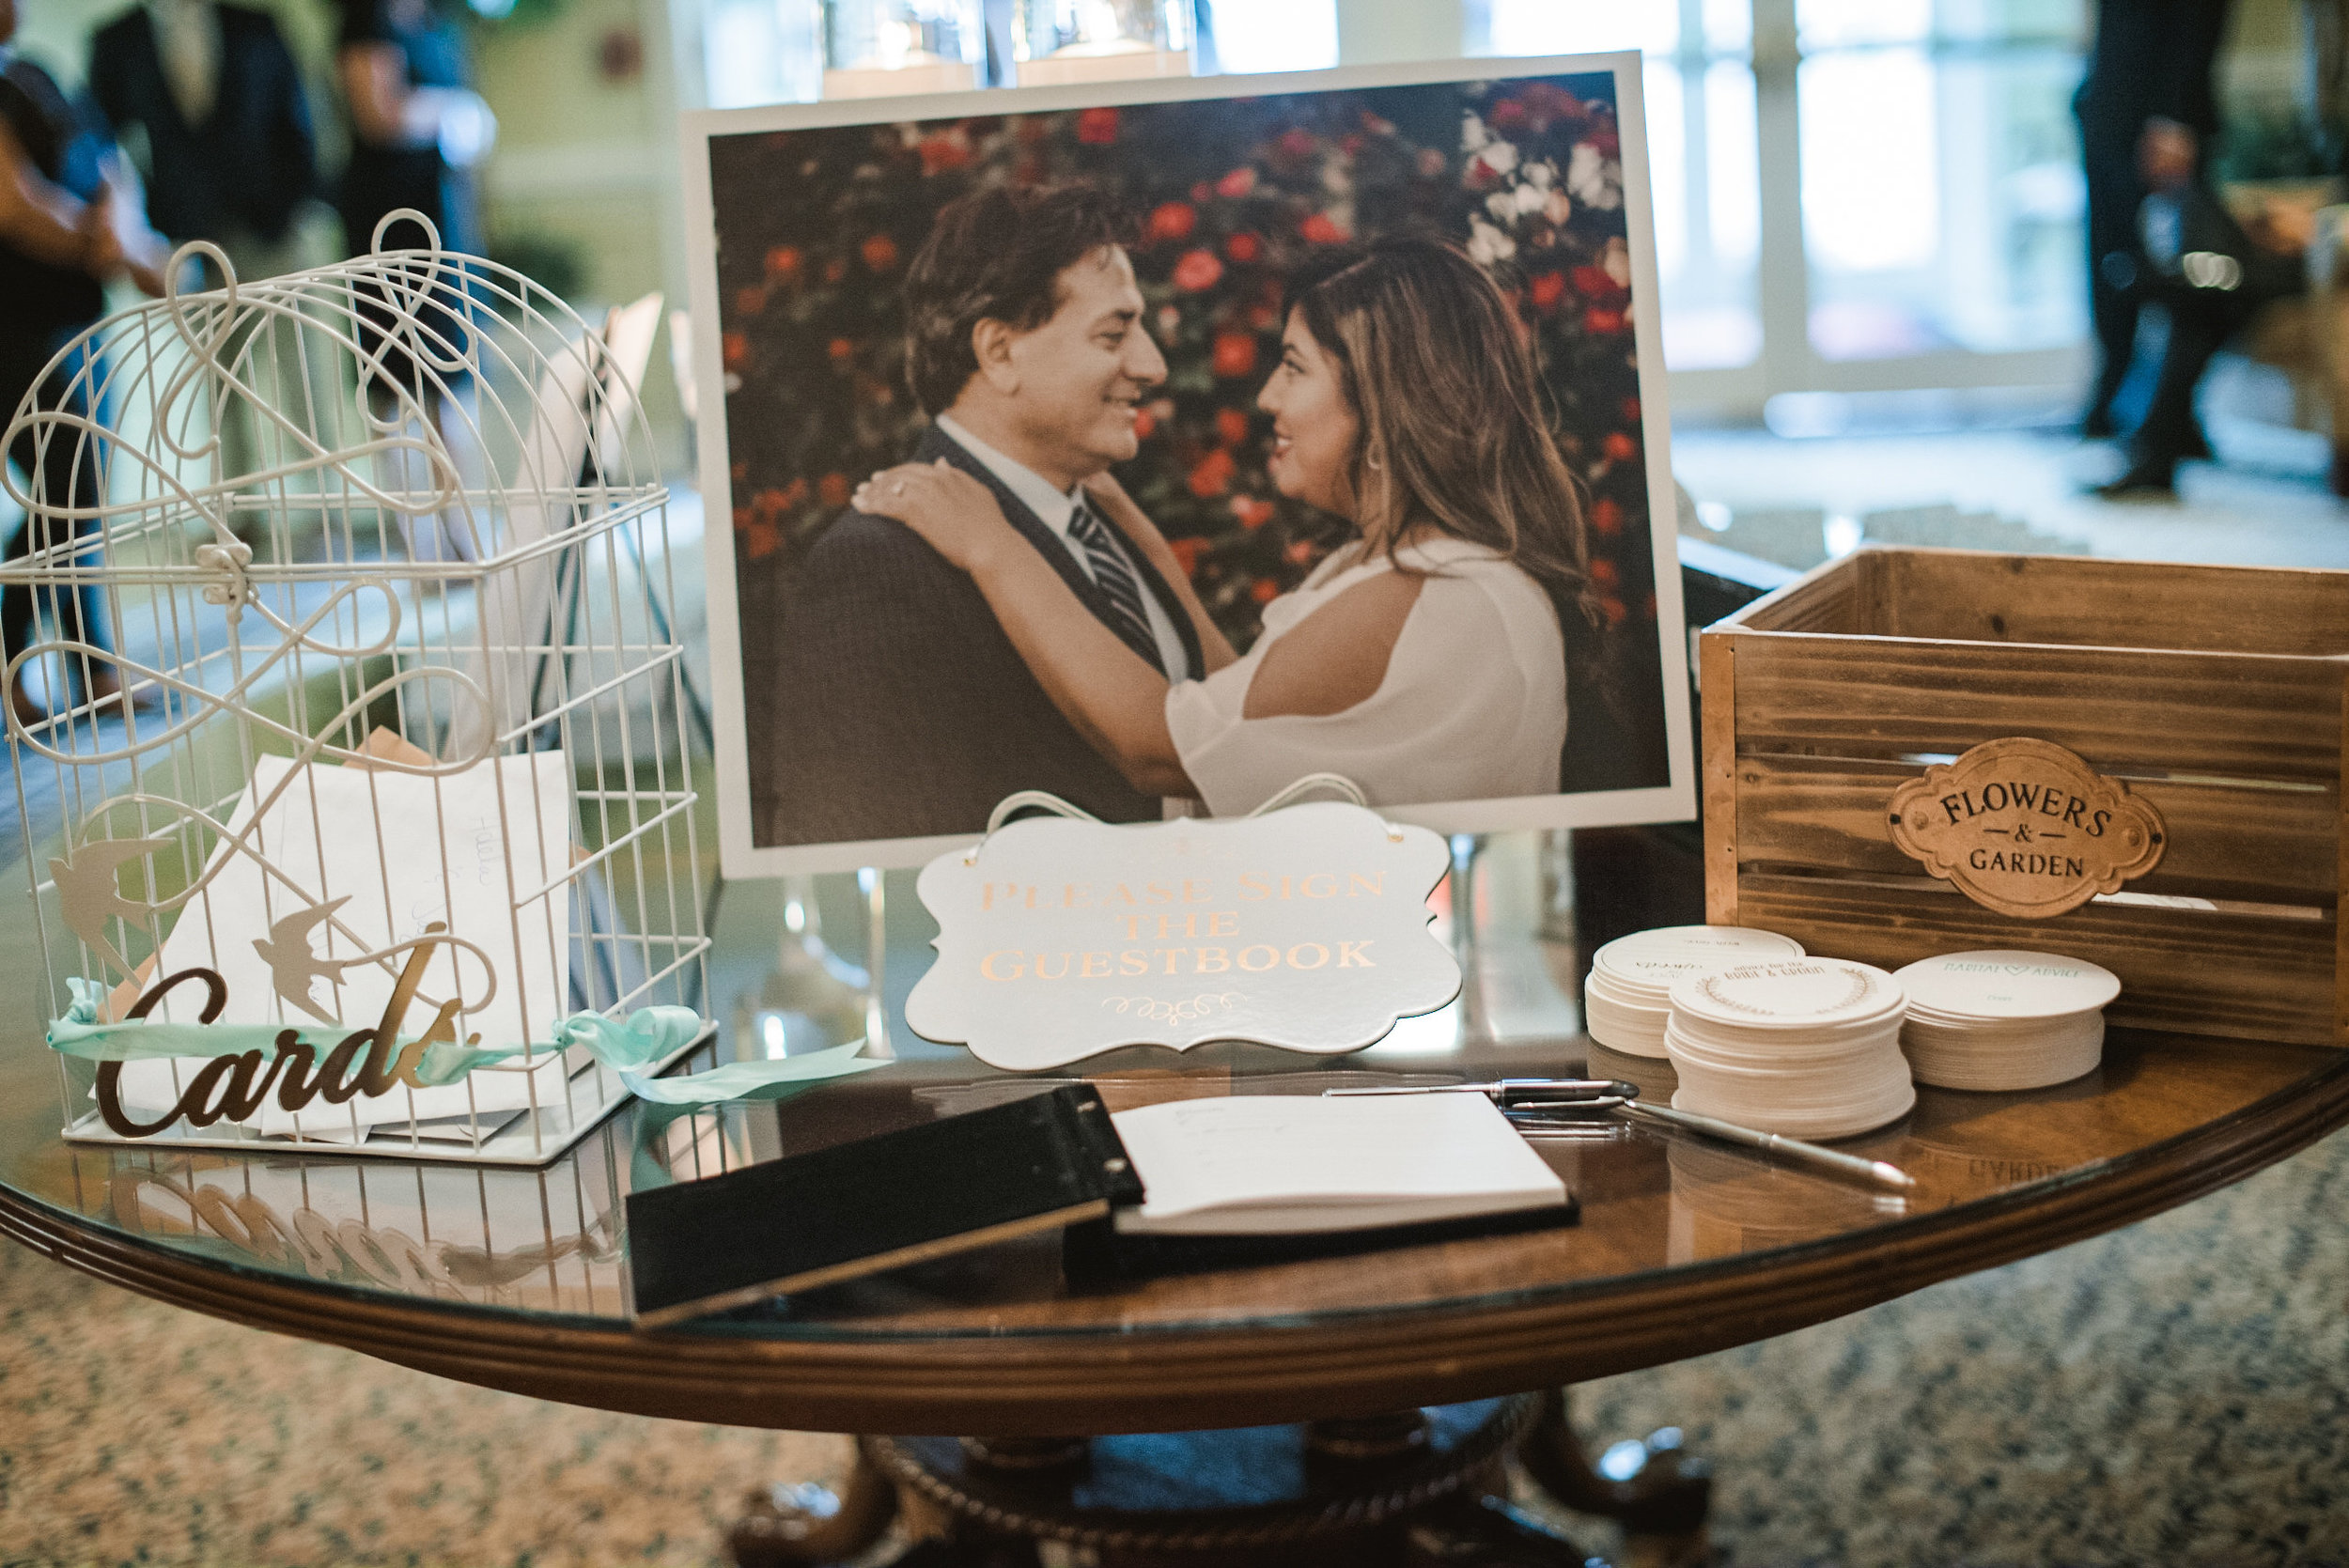 Card table at wedding reception